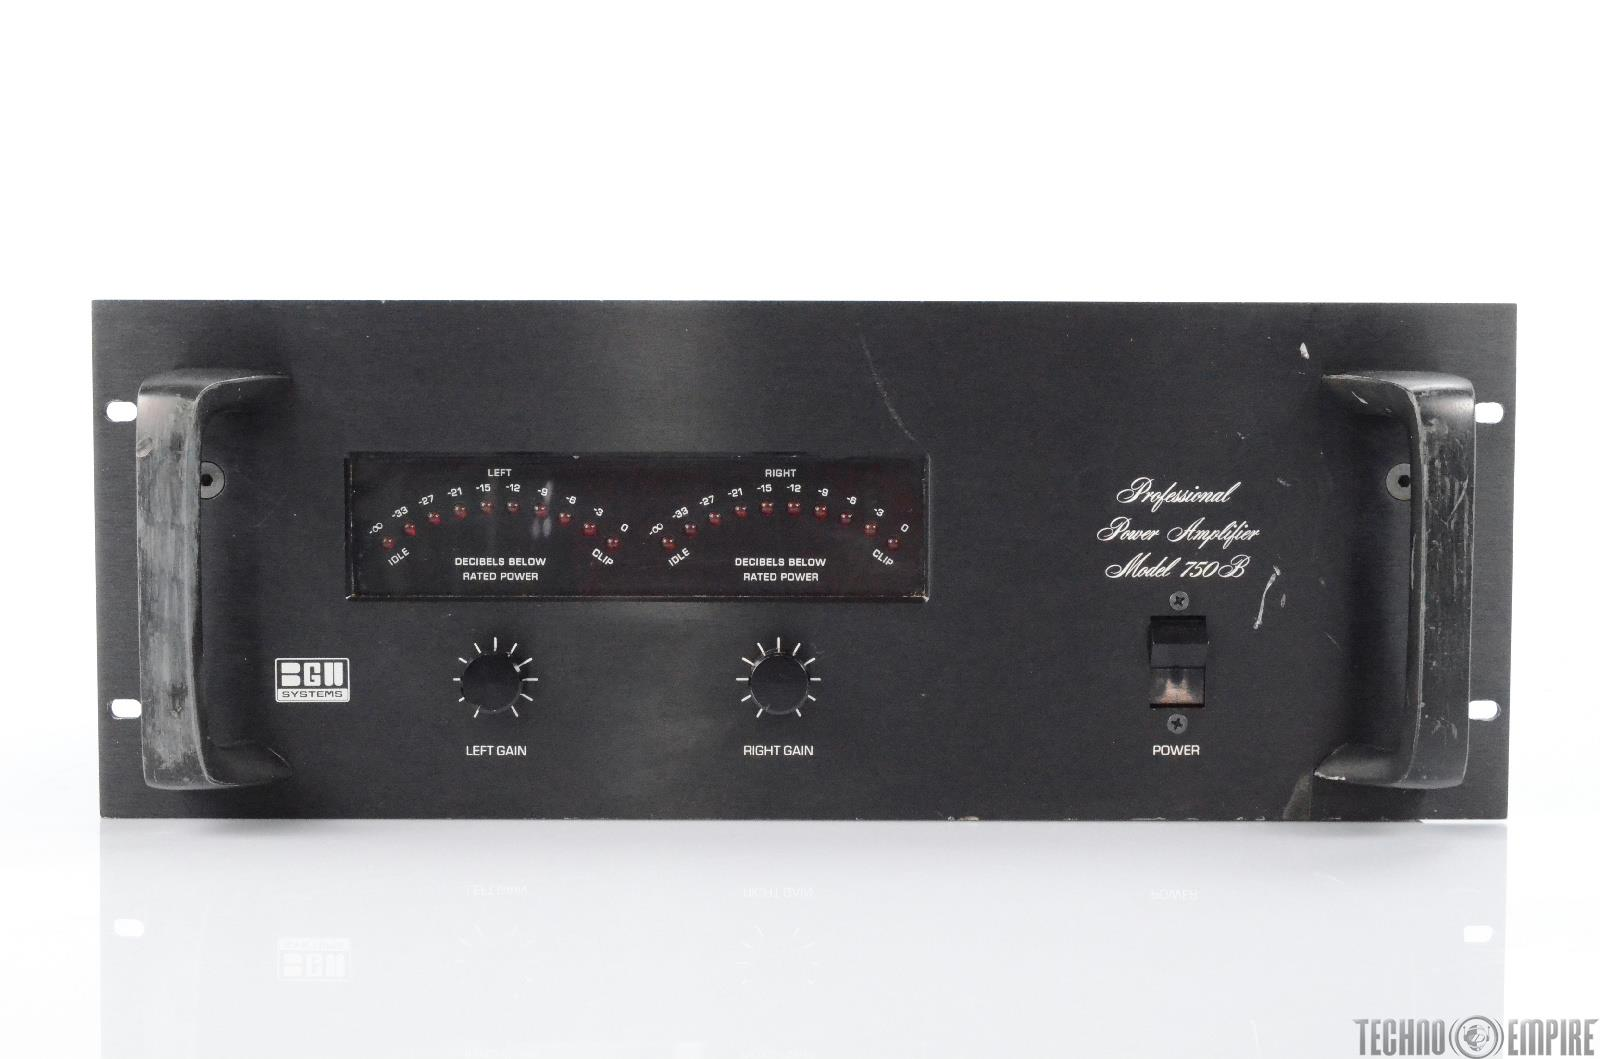 BGW Model 750B Professional Stereo Power Amplifier Rack Amp 225W #29614